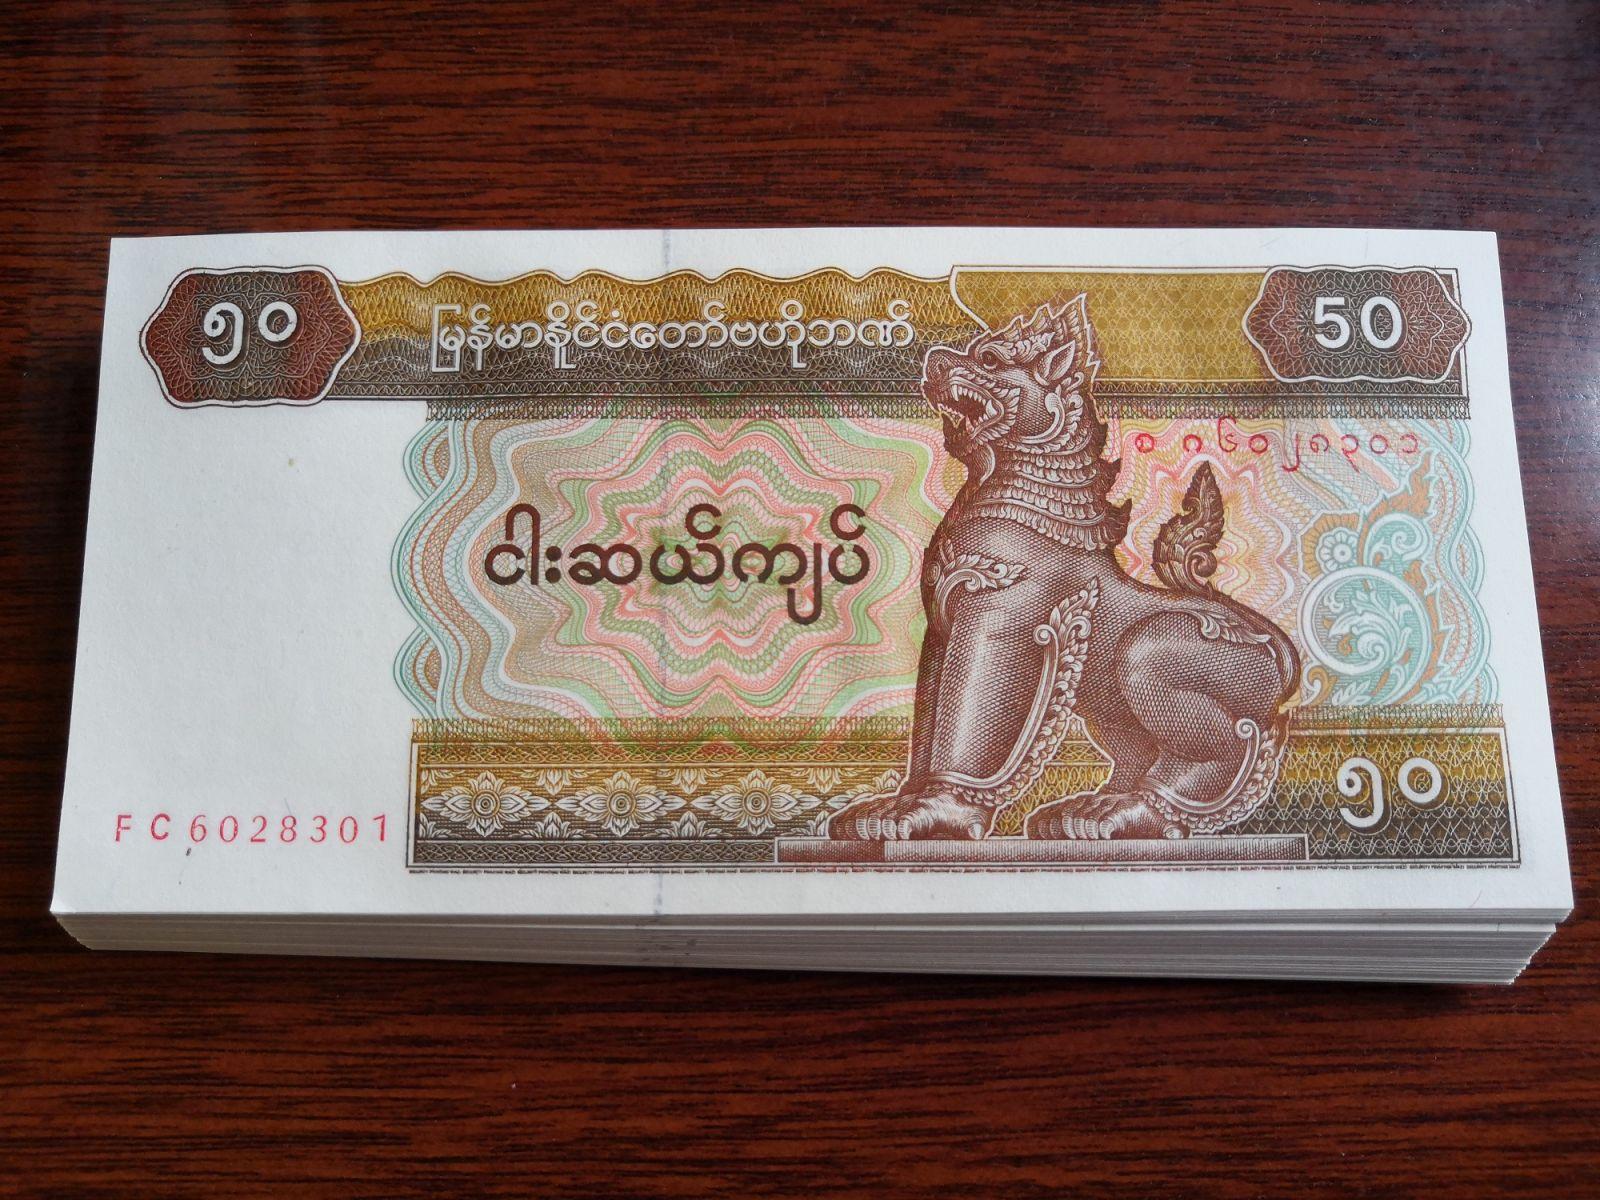 Tiền Kỳ Lân Myanmar - 100 Tờ